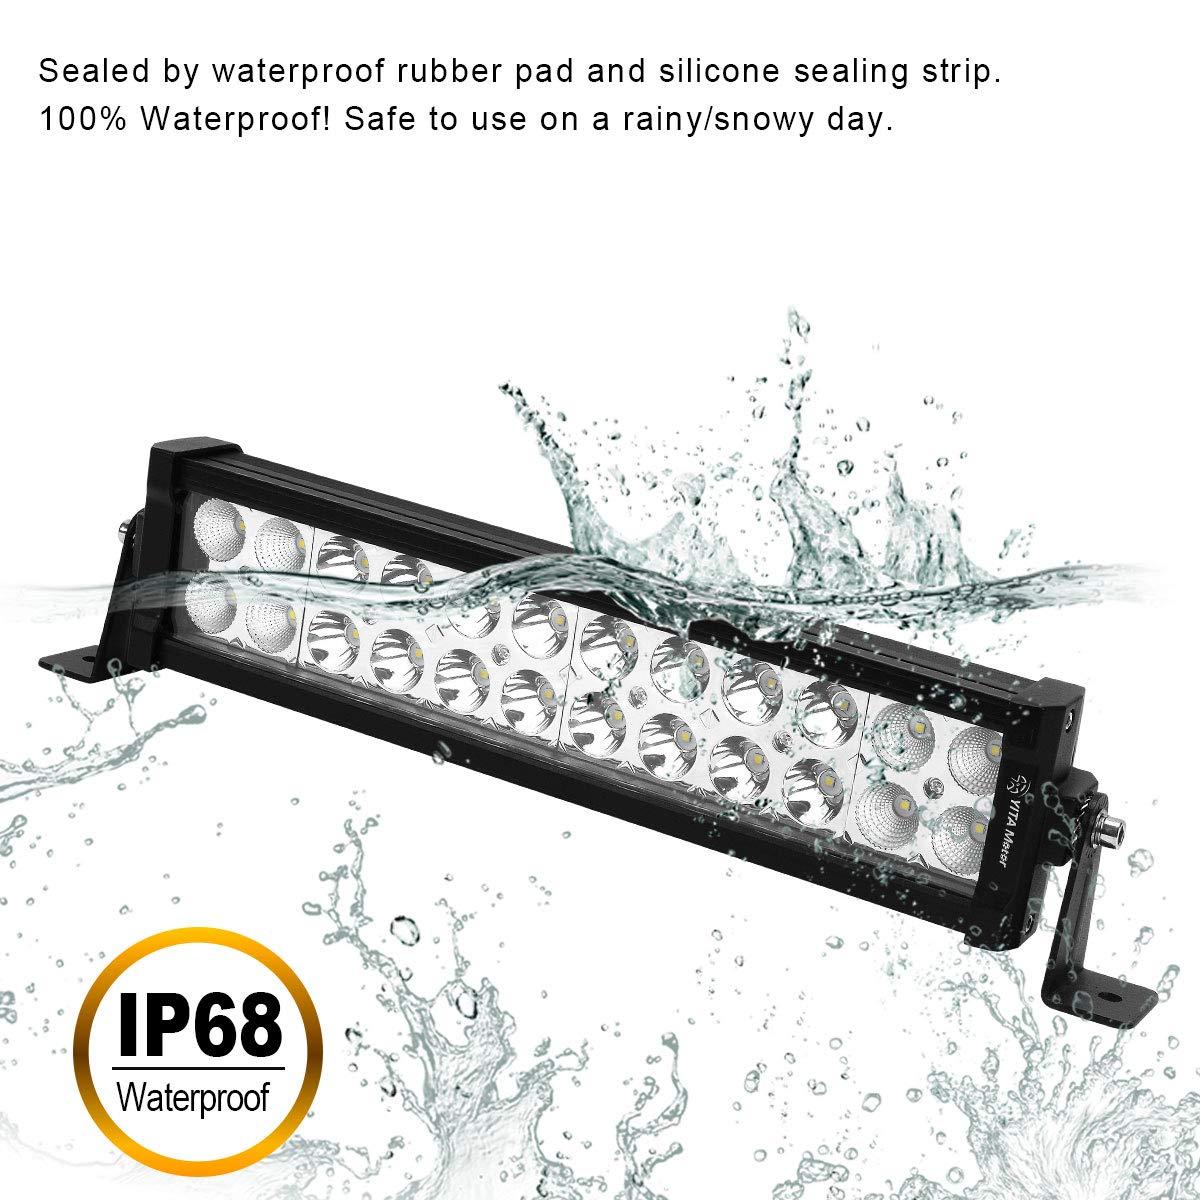 YITAMOTOR Led Light Bar Wiring Harness 72W 14Inch Led Work Light Spot Flood Combo LED Light Pods Offroad Driving Light Waterproof Led Light 4WD ATV 4X4 SUV Truck Boat Car 12V,2 Years Warranty